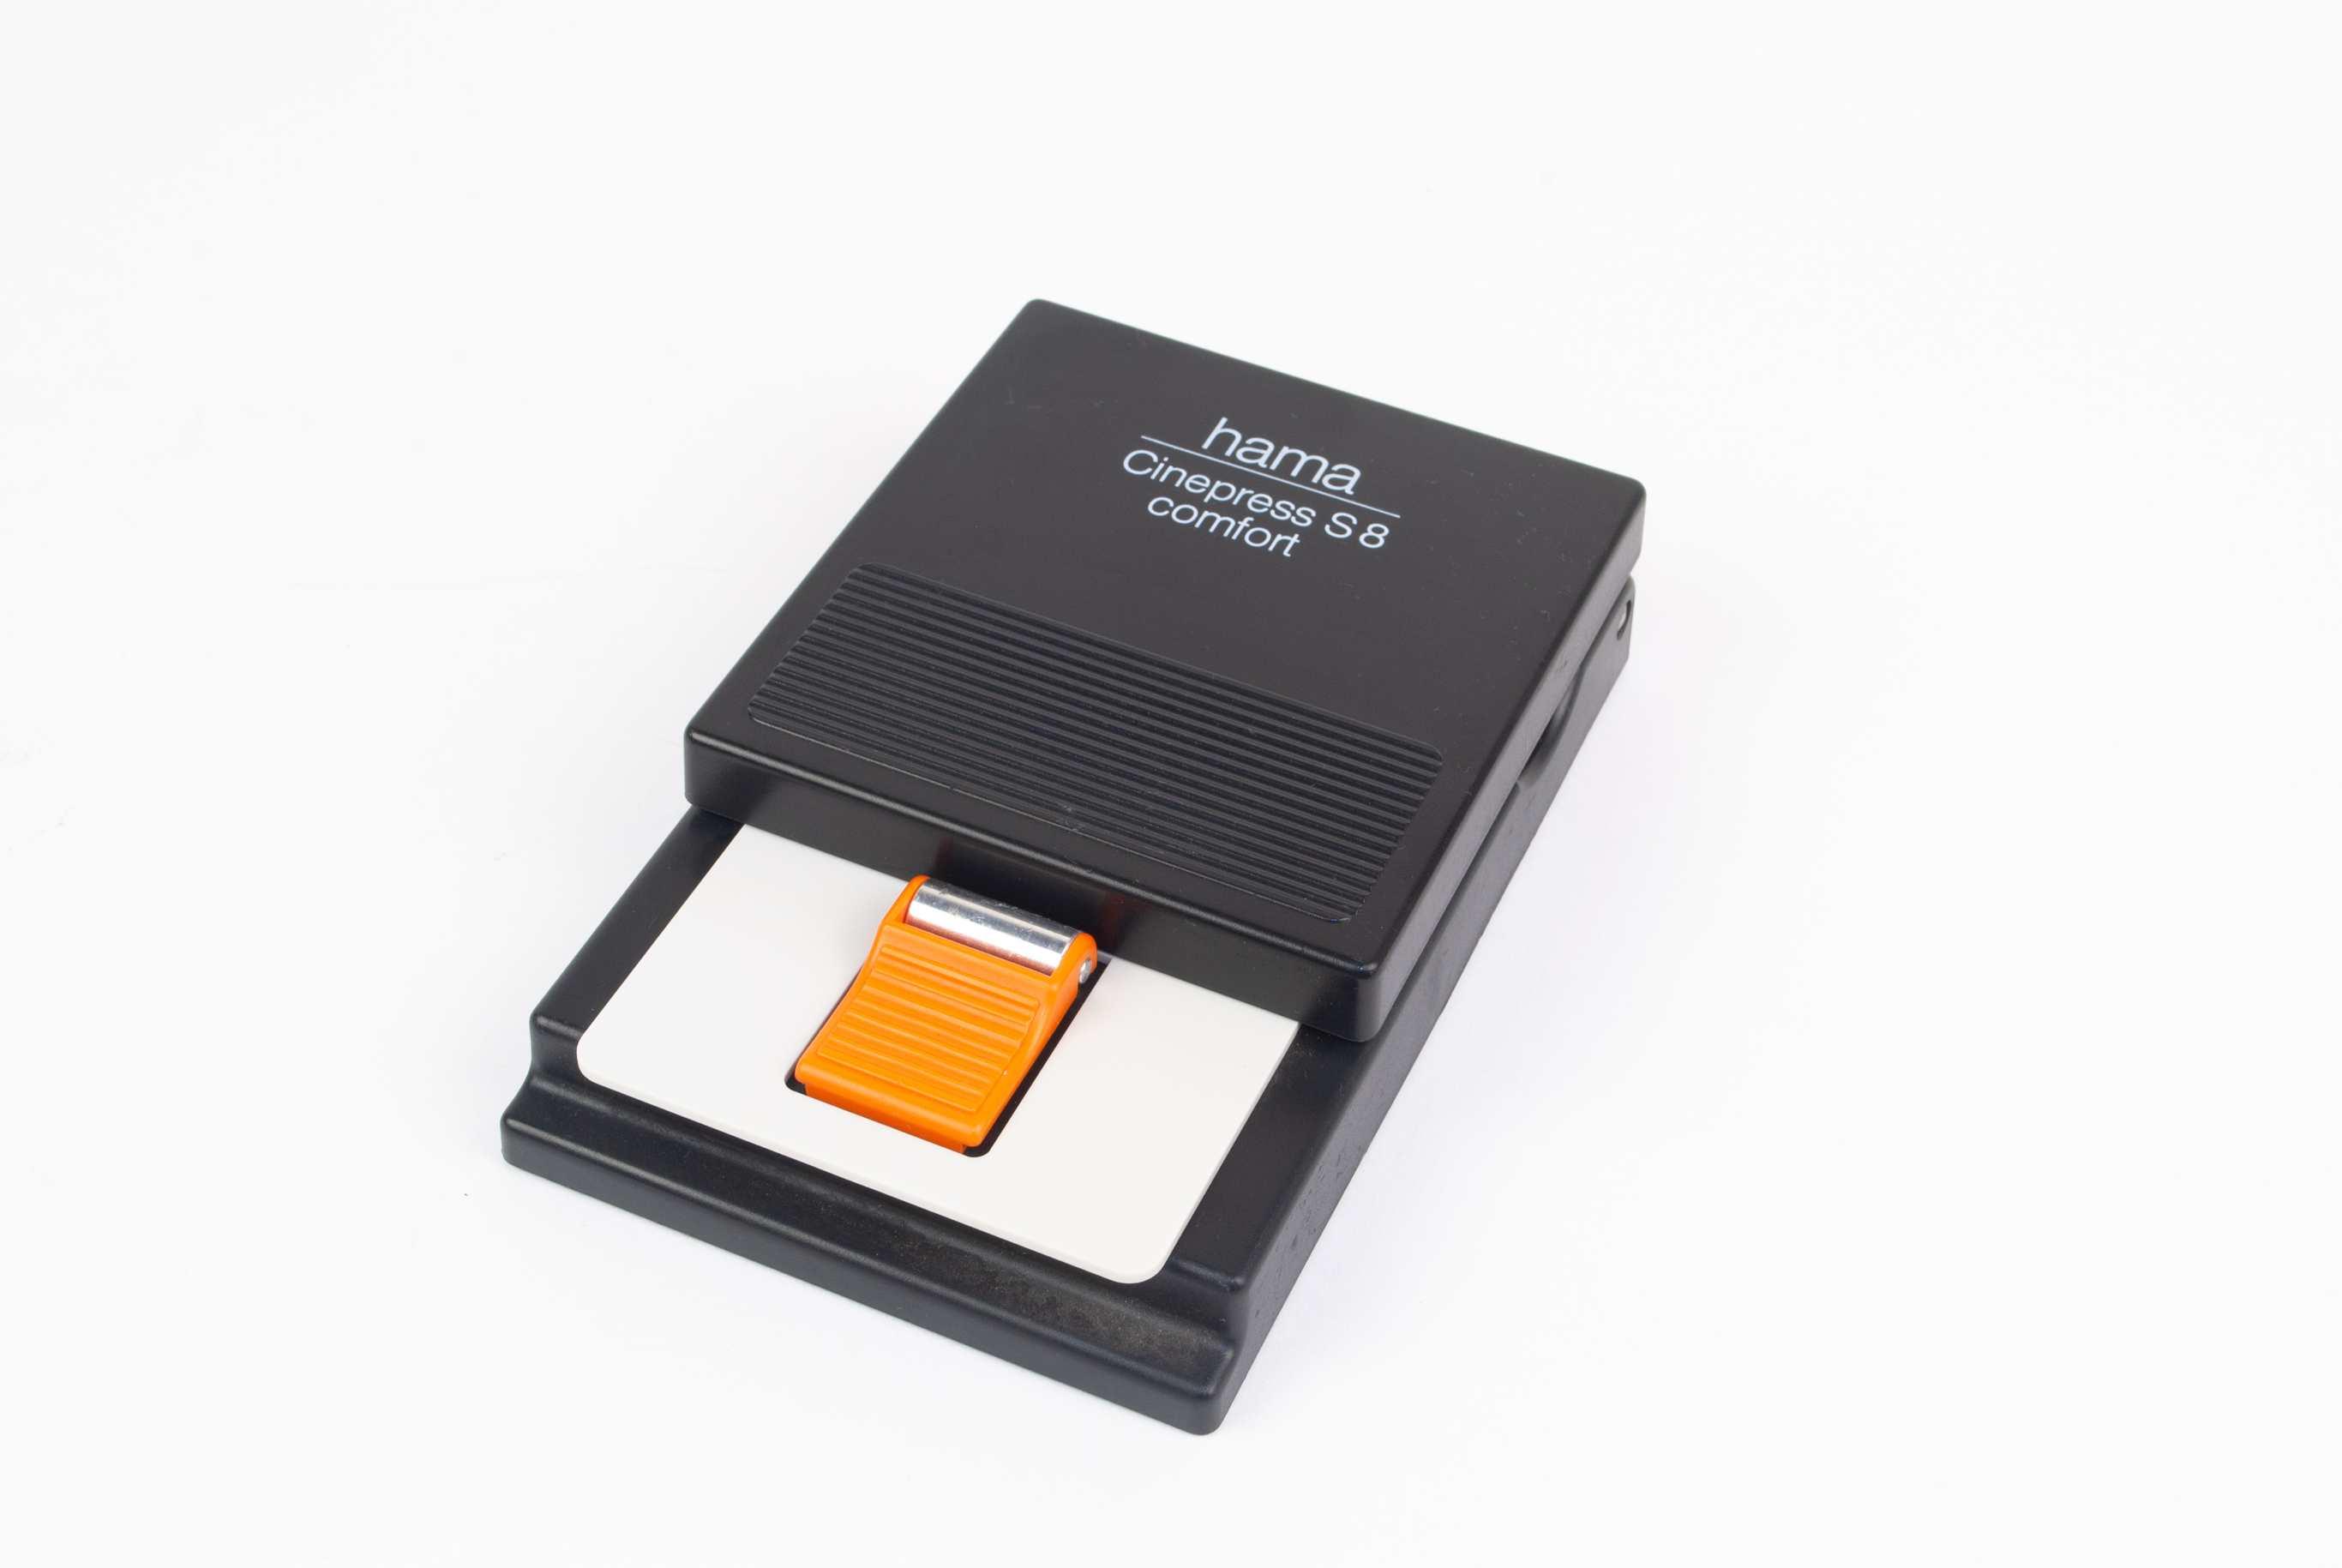 Cinepress S8 Comfort (3783)